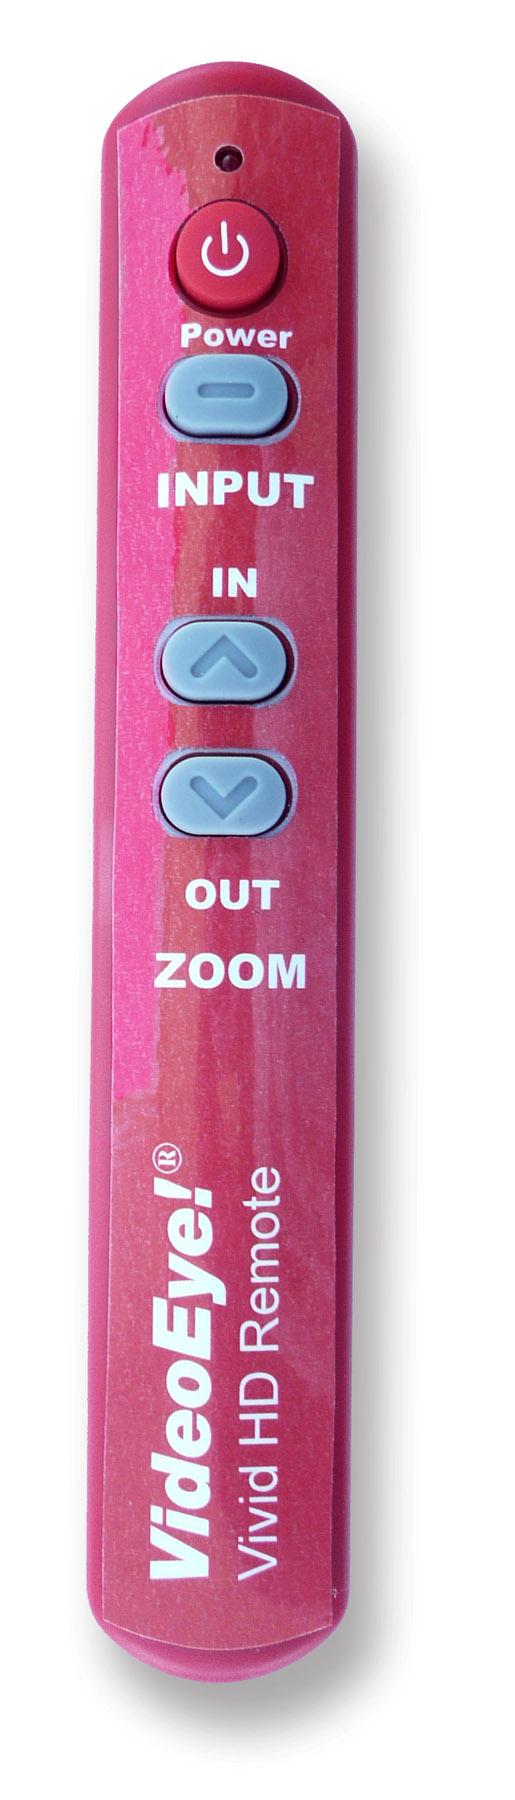 Remote control; Red stick.jpg